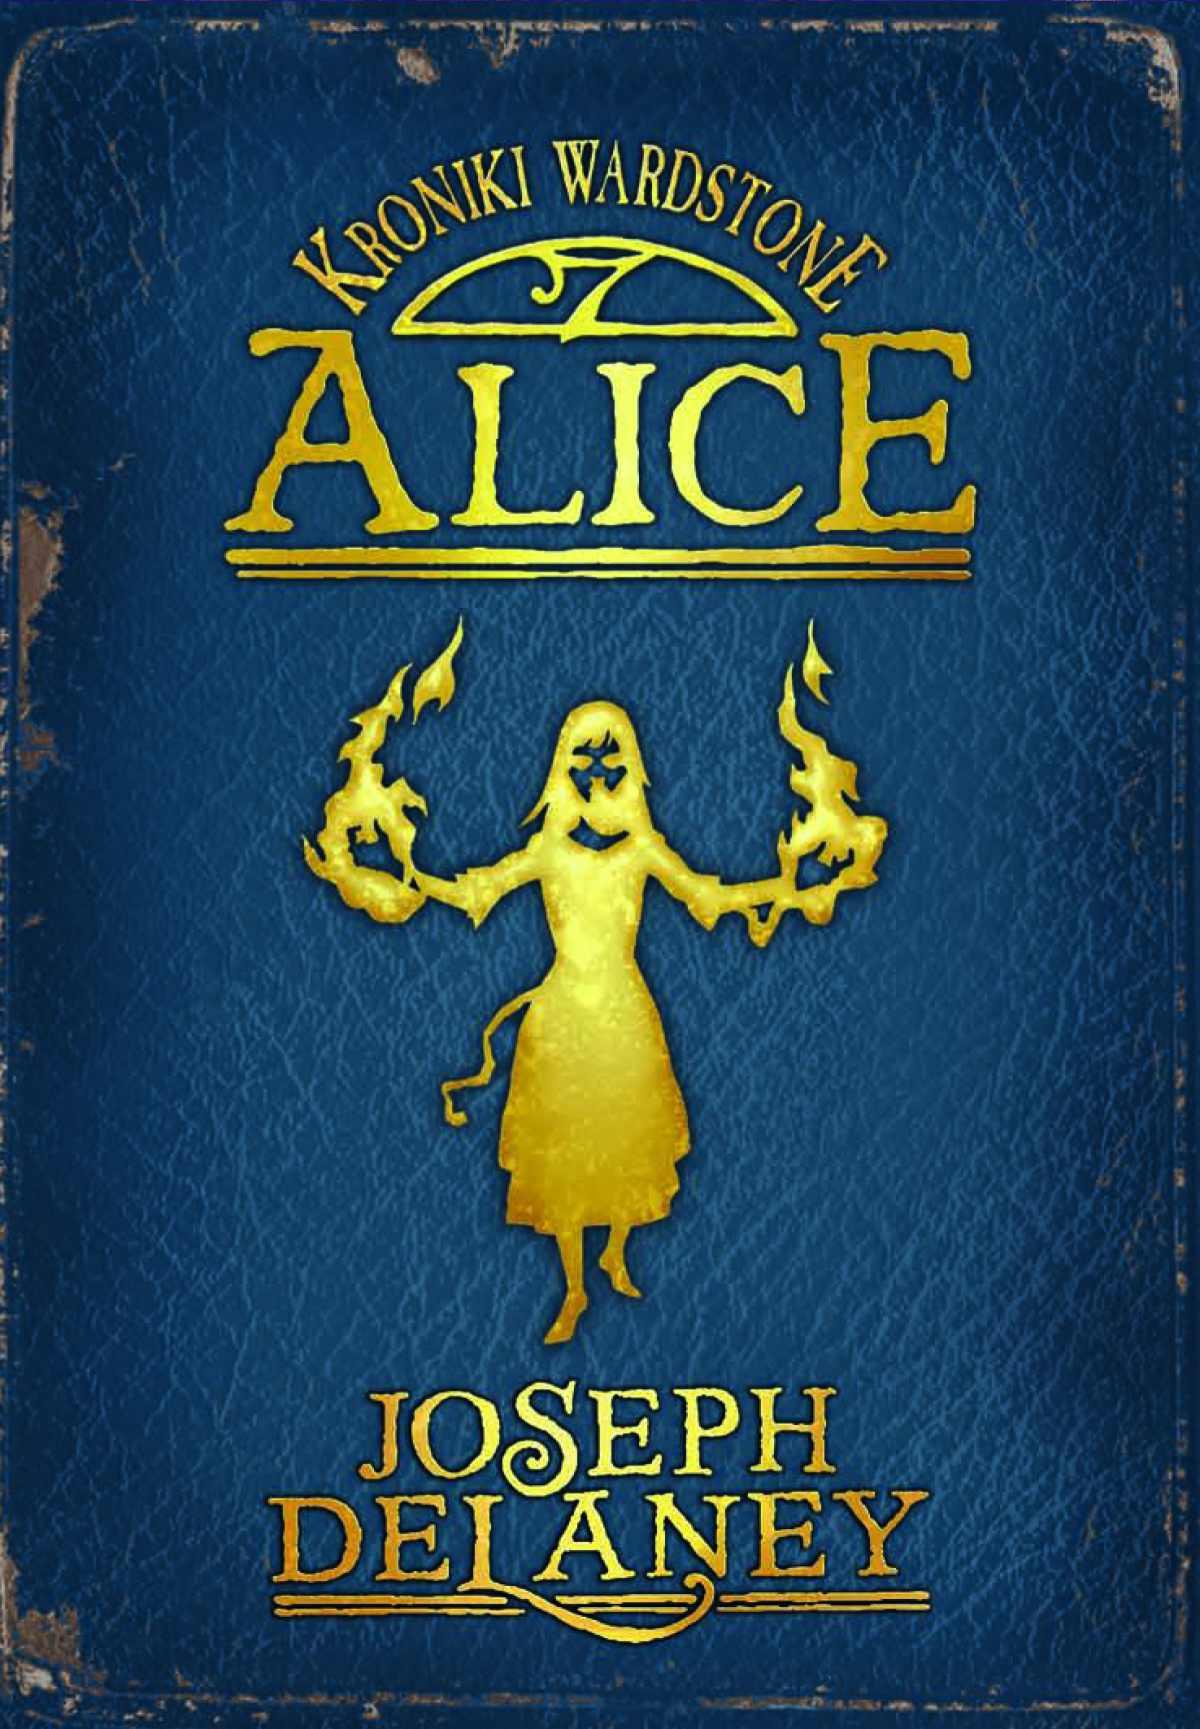 Kroniki Wardstone 12. Alice - Ebook (Książka na Kindle) do pobrania w formacie MOBI